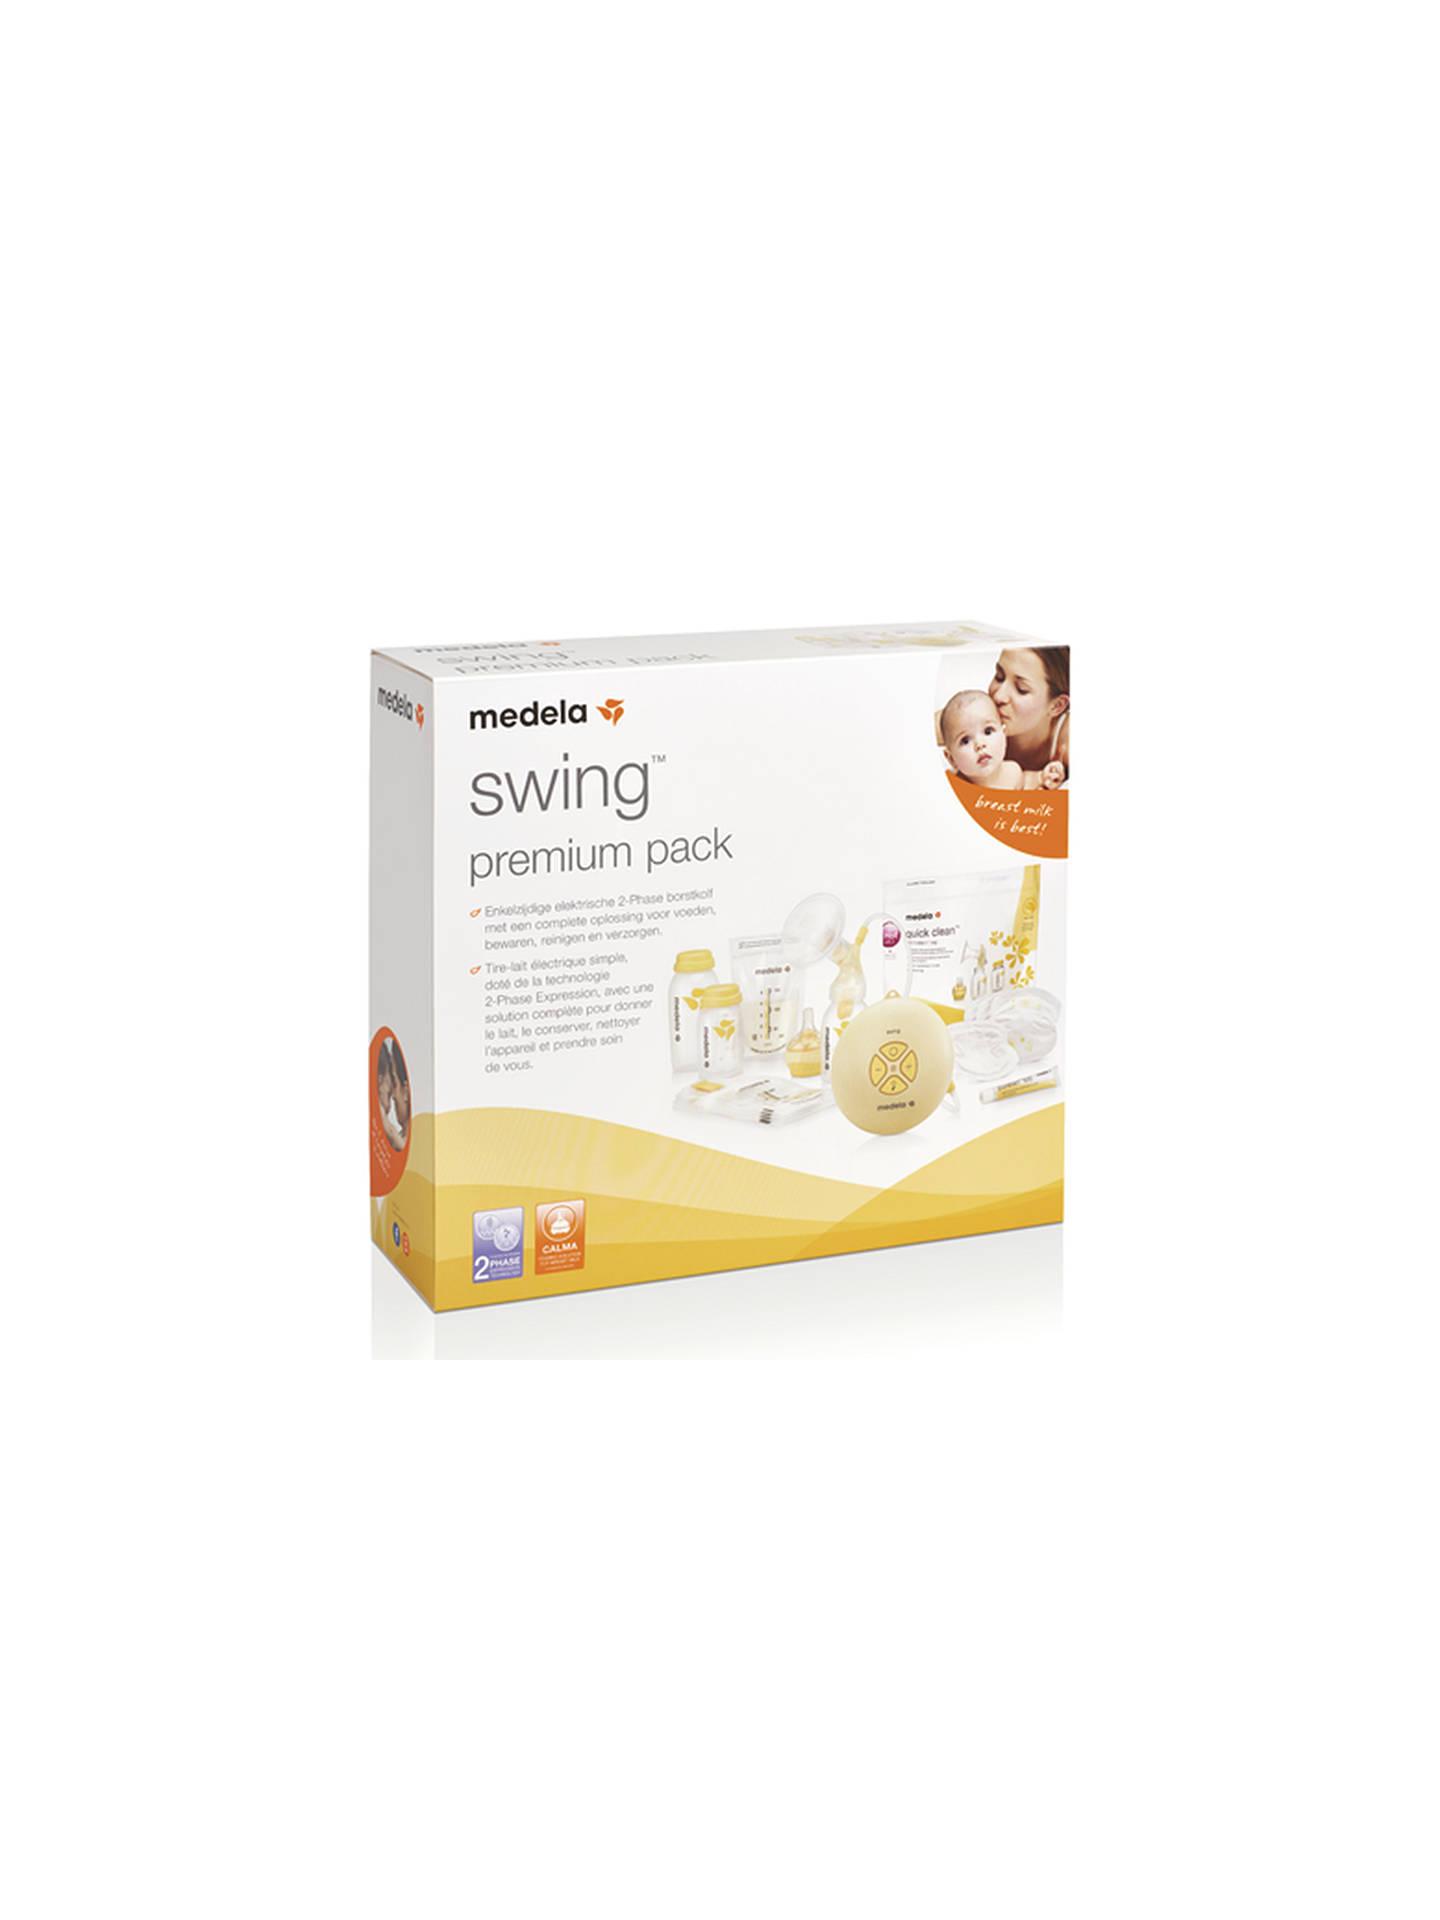 Medela Swing Premium Edition Breast Pump At John Lewis Partners